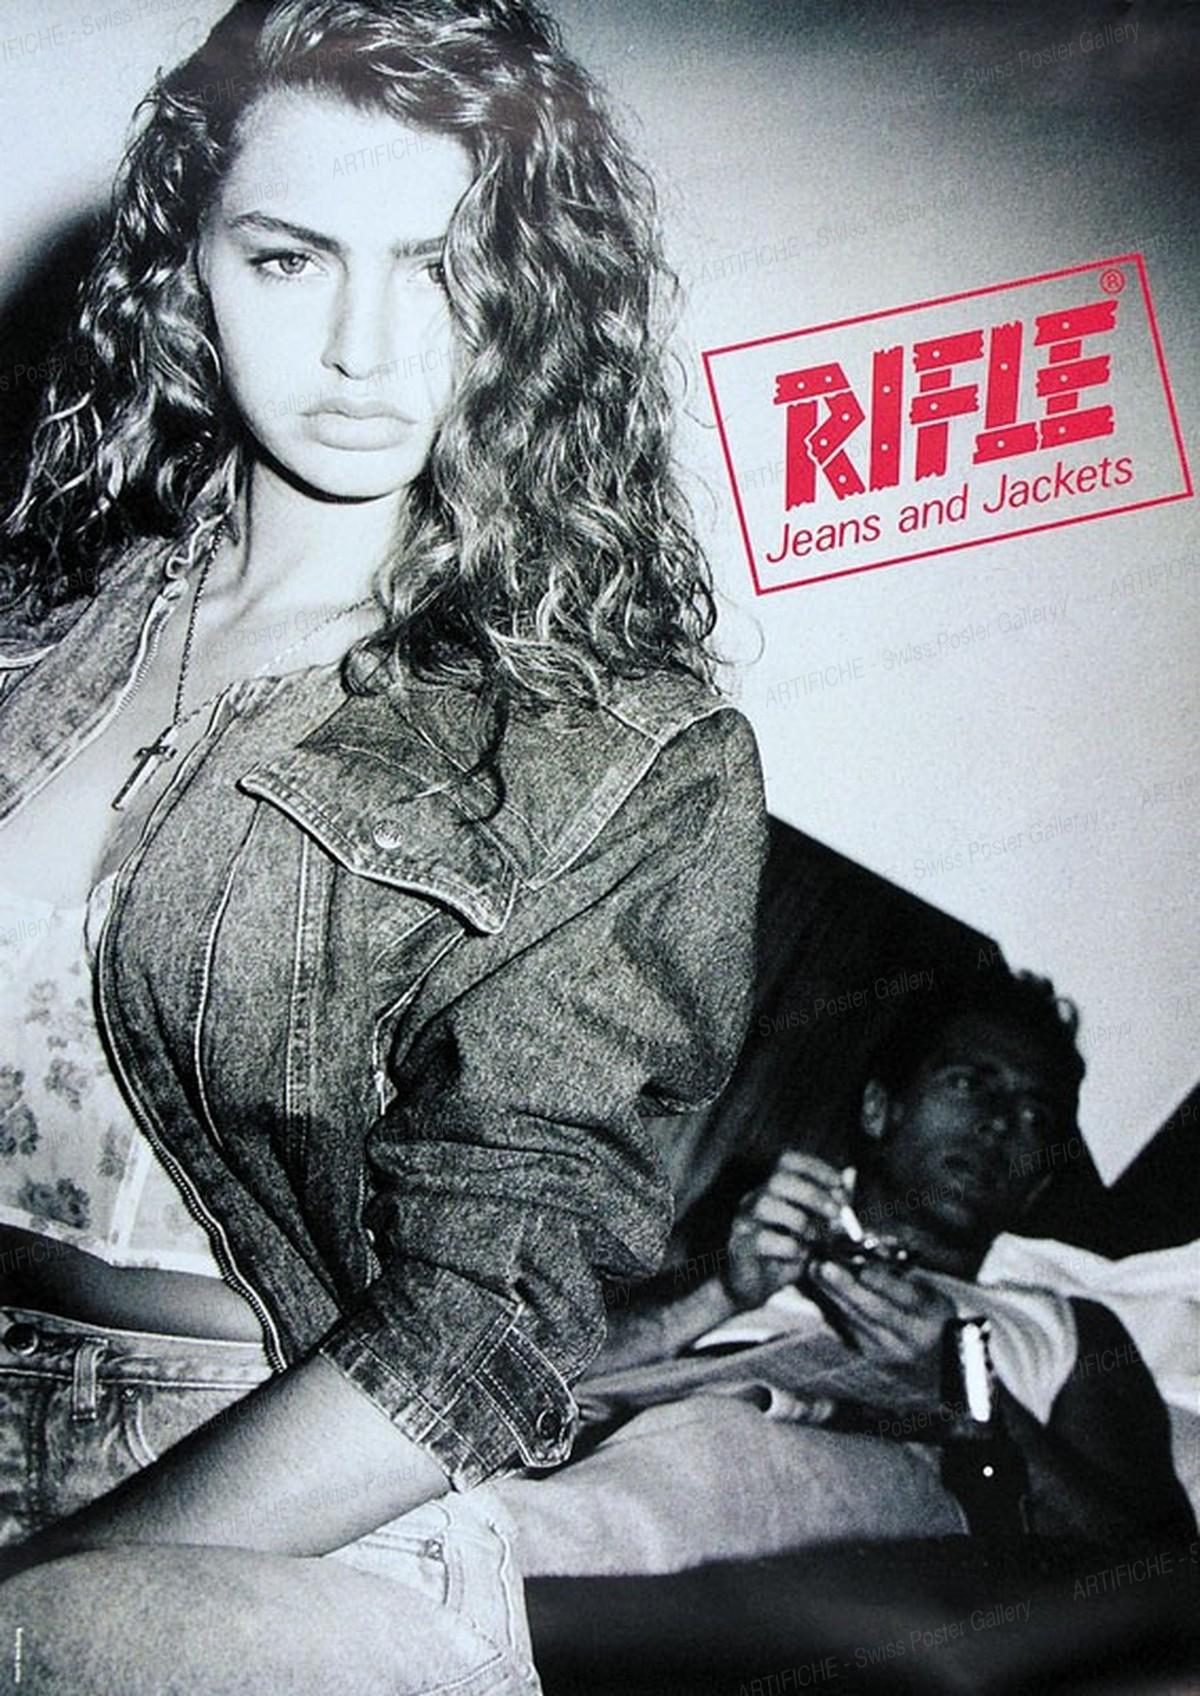 Rifle Jeans & Jackets, Peter - Photo: B. Bisang Marti